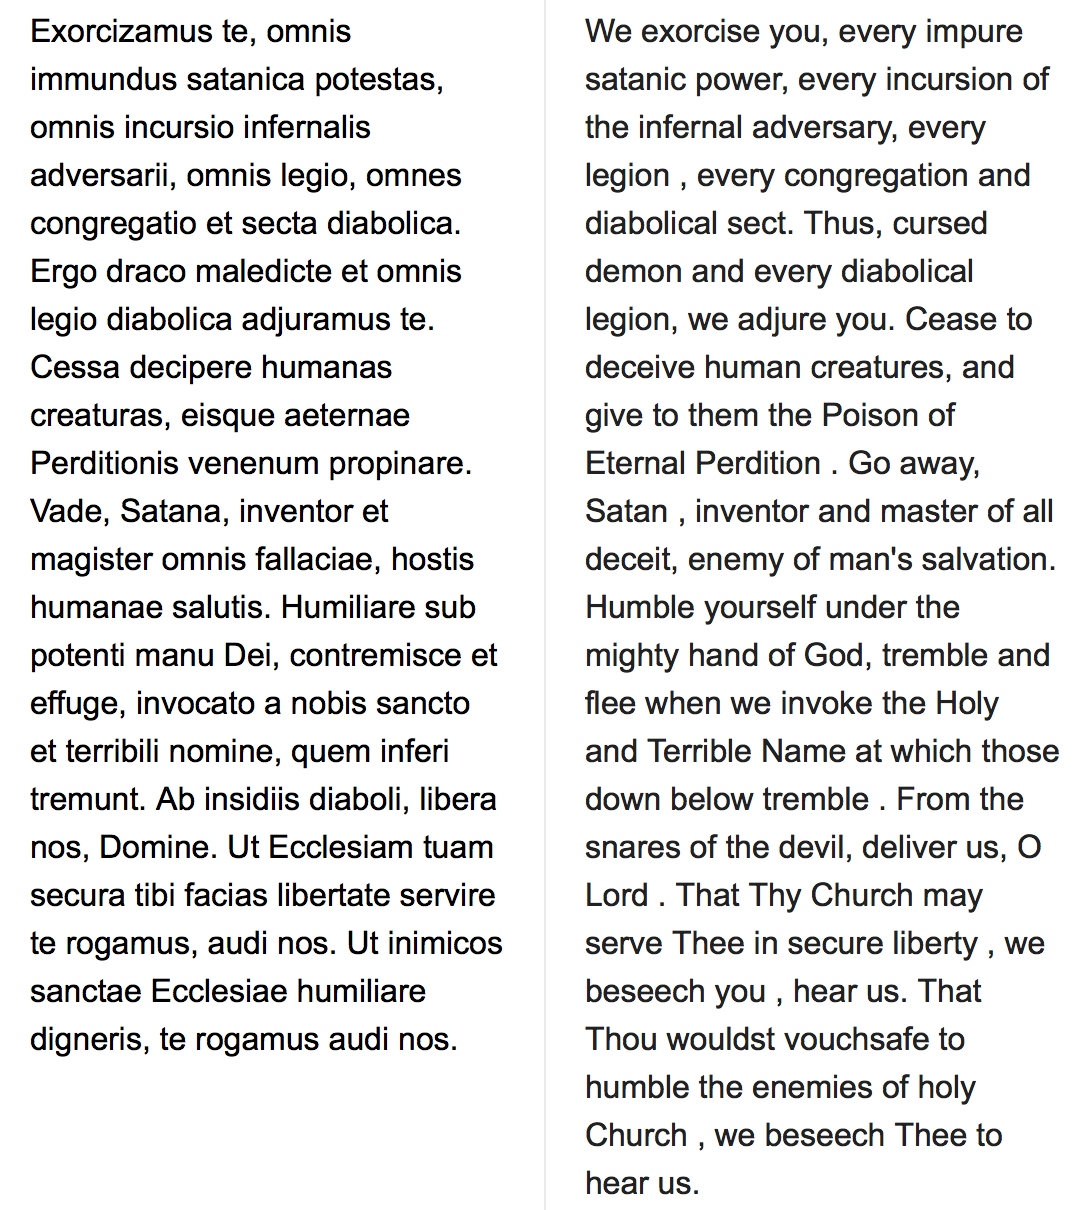 Exorcism prayer in Latin and English | Supernatural